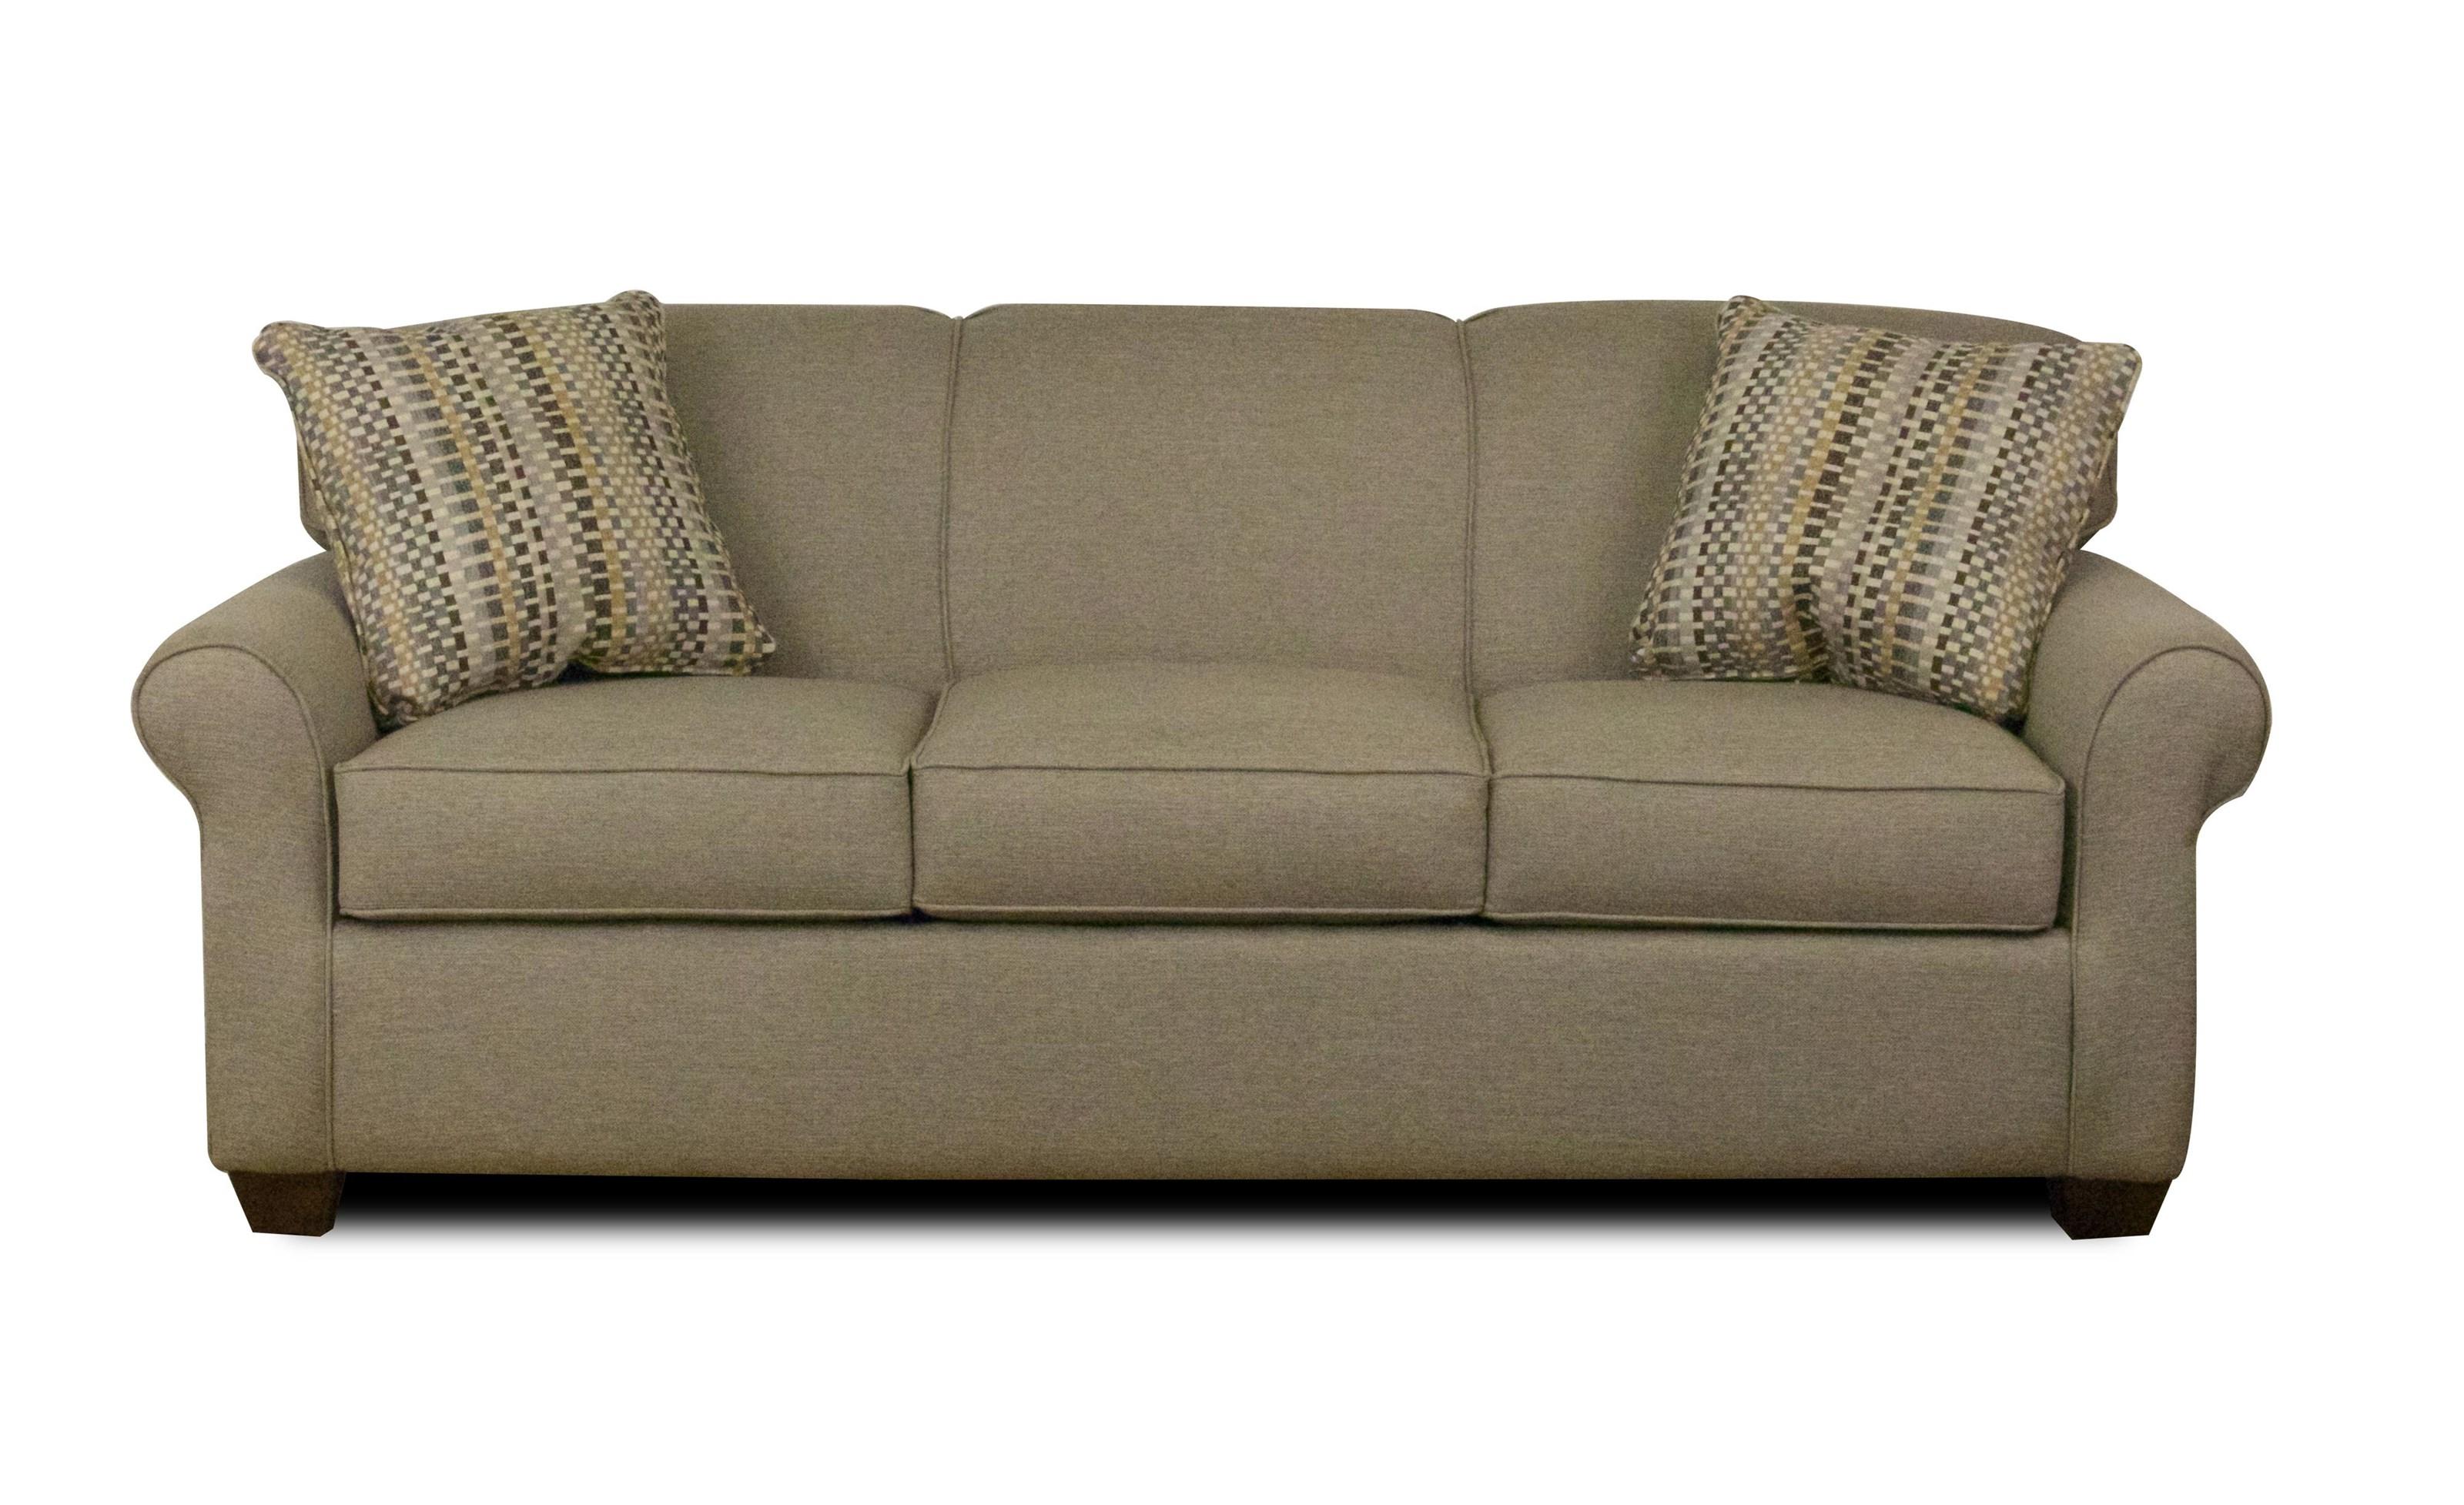 Metropia Mason Dreamquest Queen Sleeper Sofa | Ruby Gordon Furniture U0026  Mattresses | Sleeper Sofas